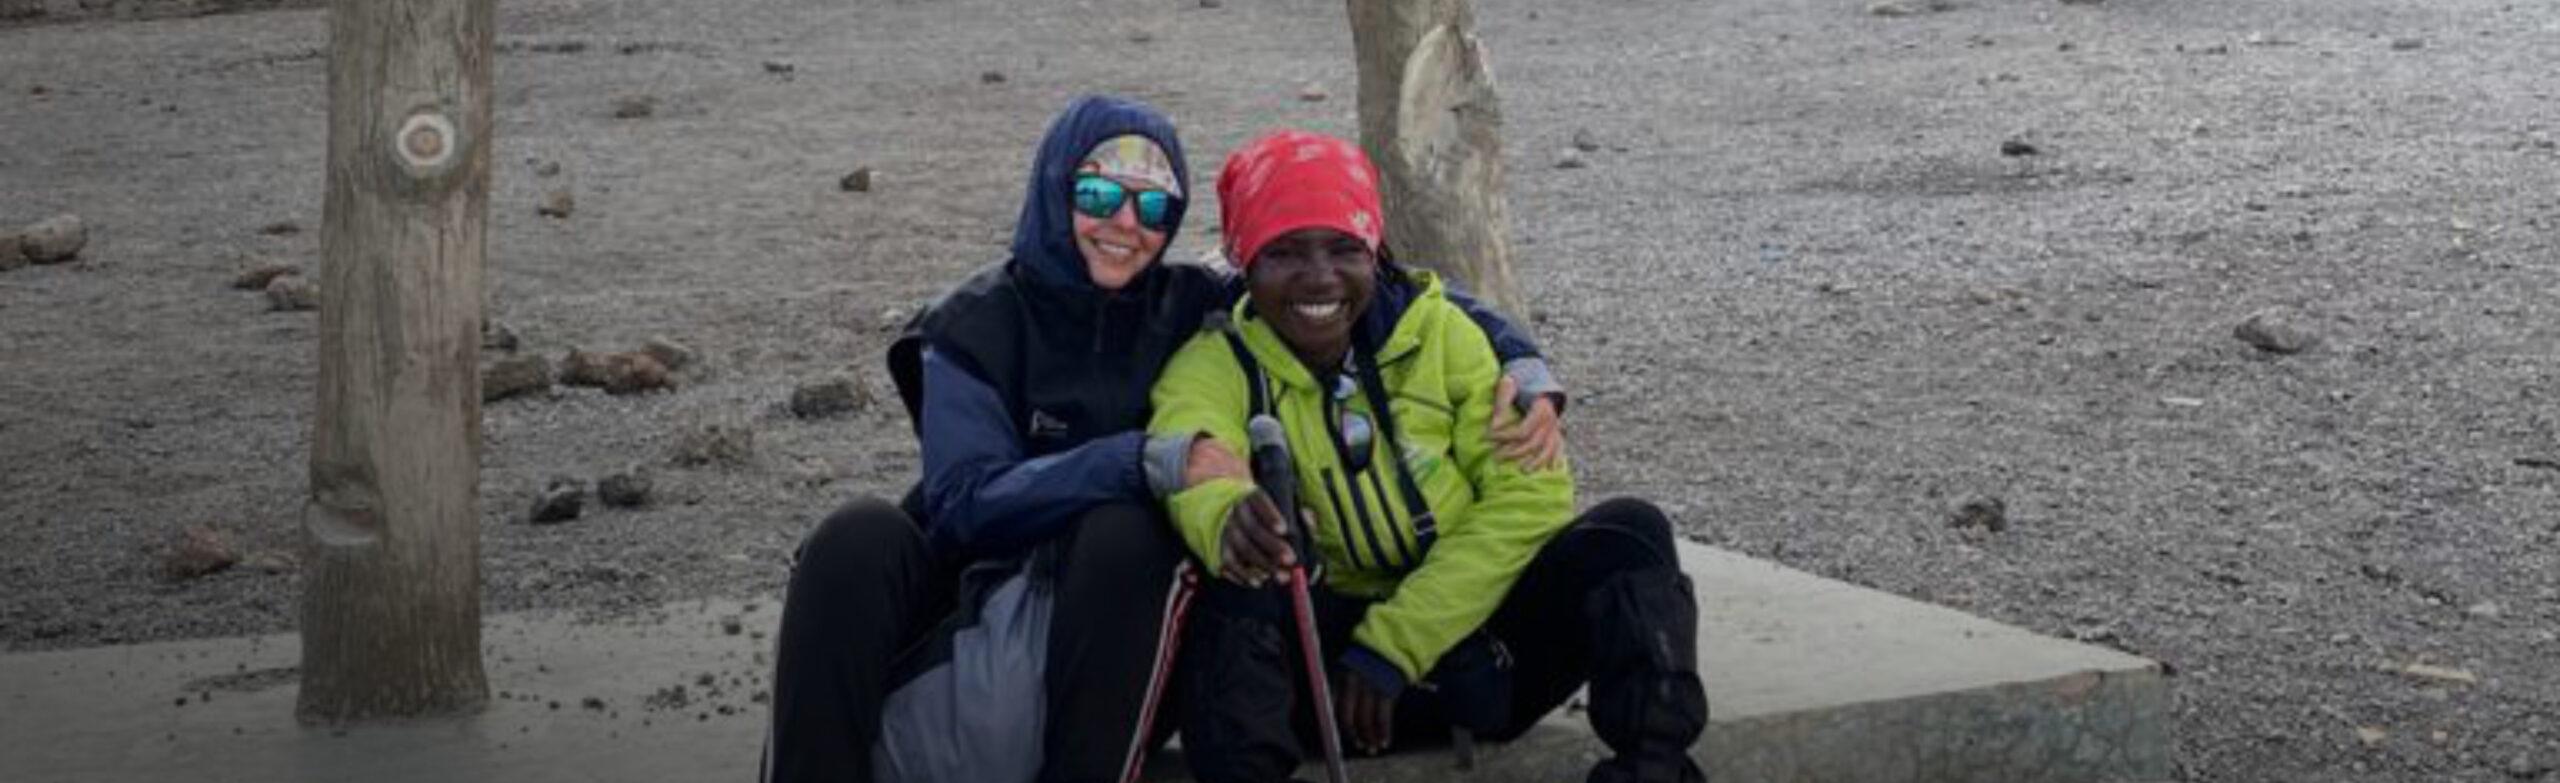 Kili Day Trips Hikes